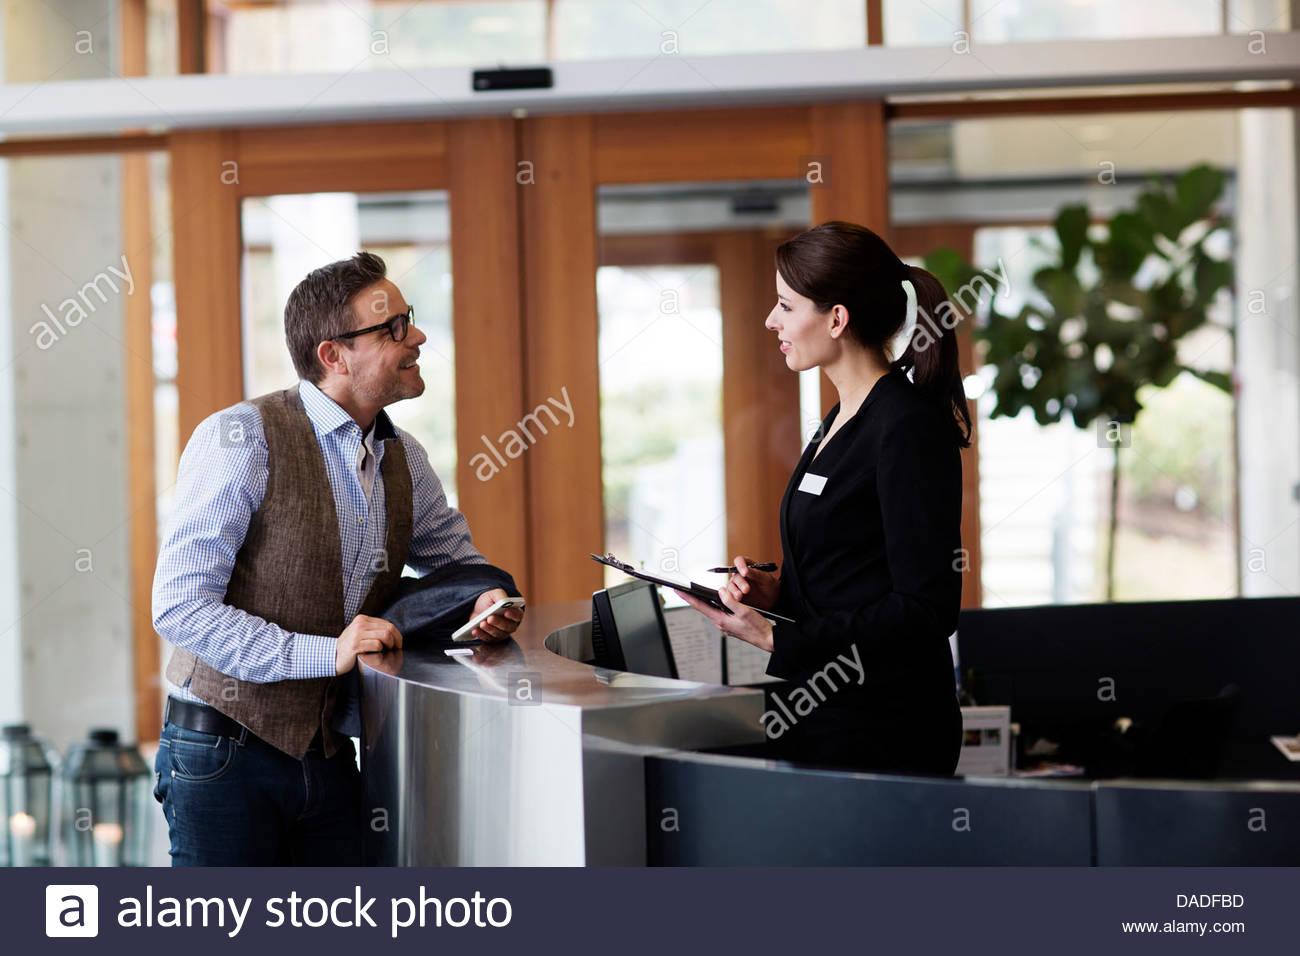 Man and woman talking - Stock Image